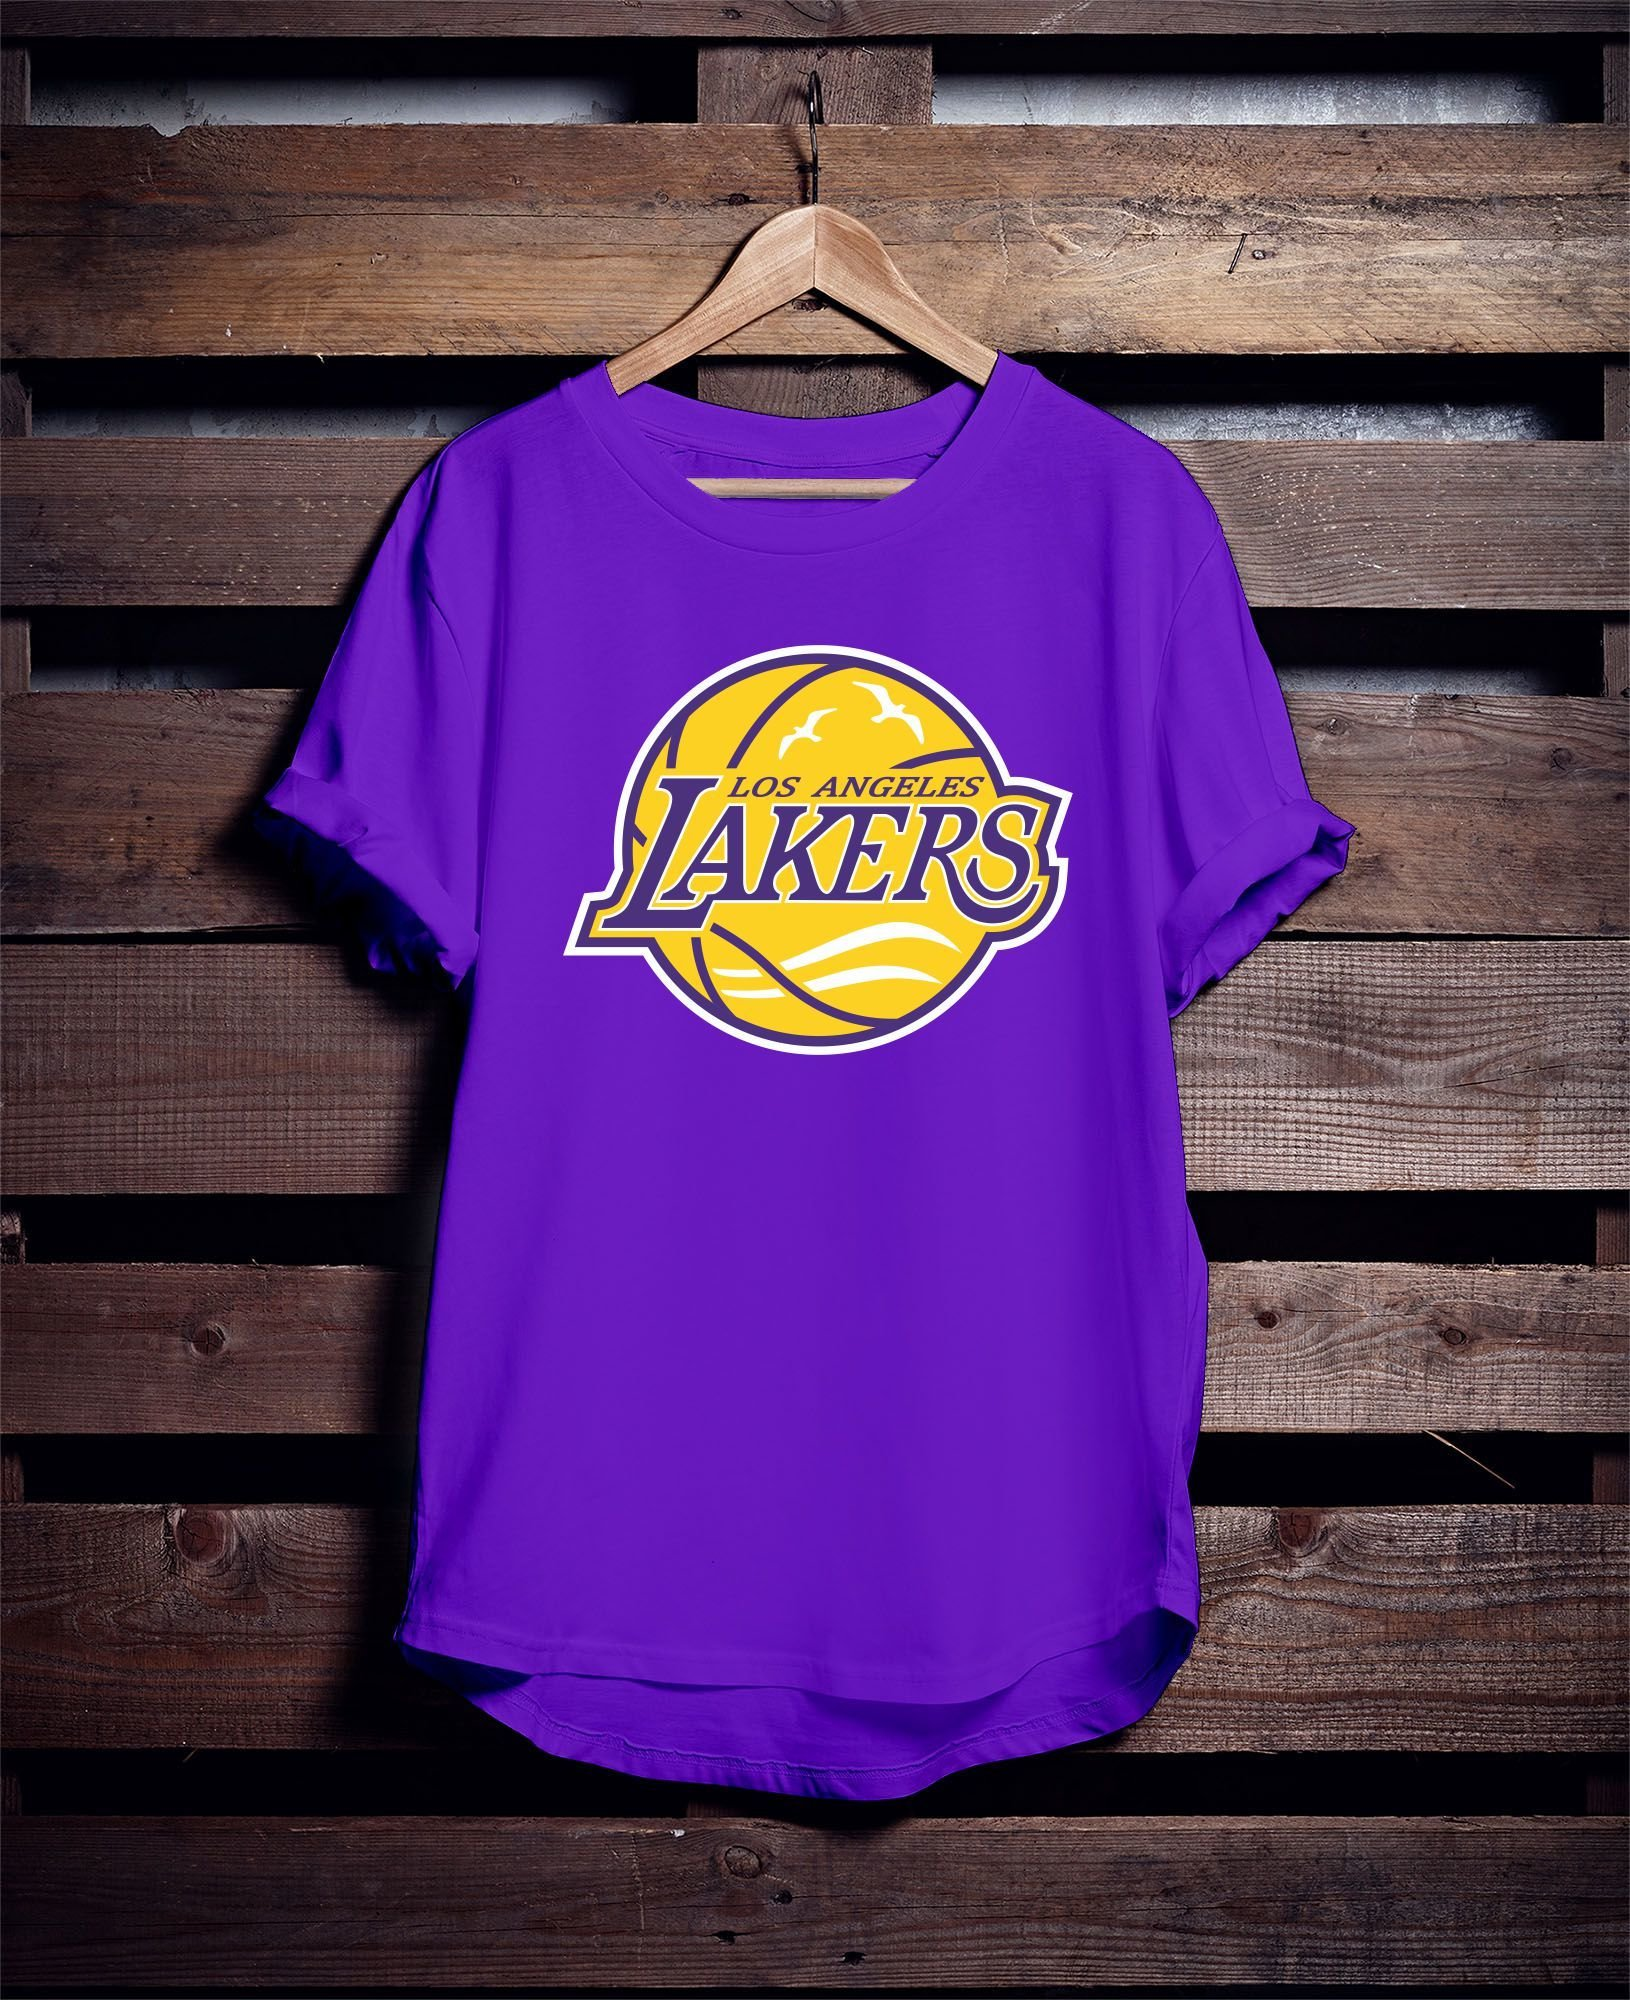 Lakers t-shirts 154